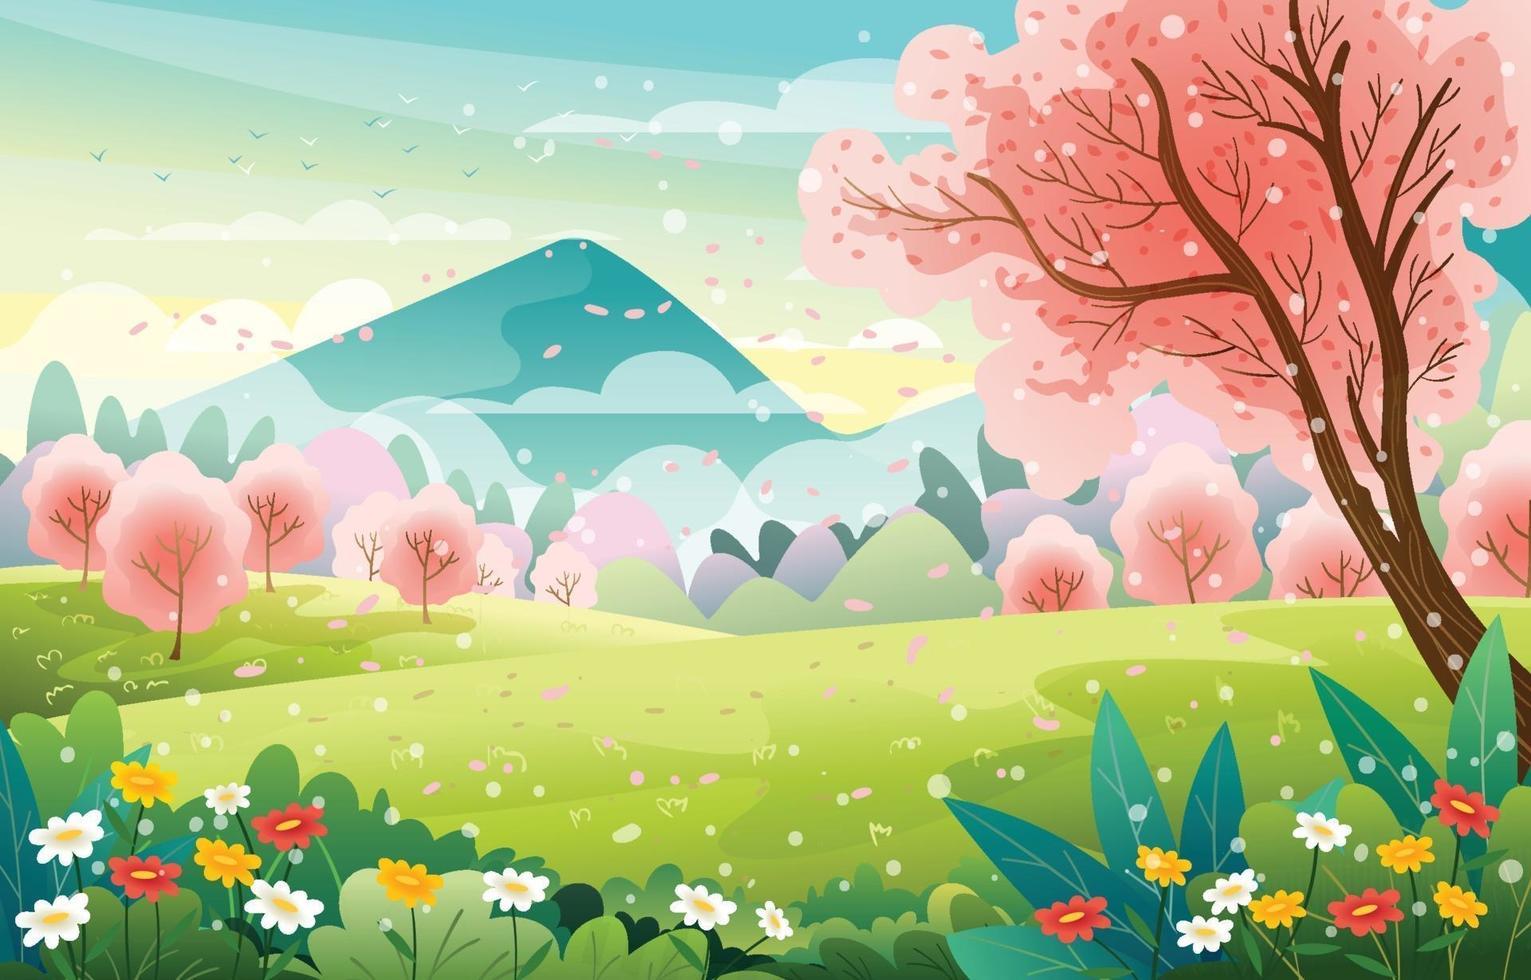 Cherry Blossom in the Spring Season Landscape vector